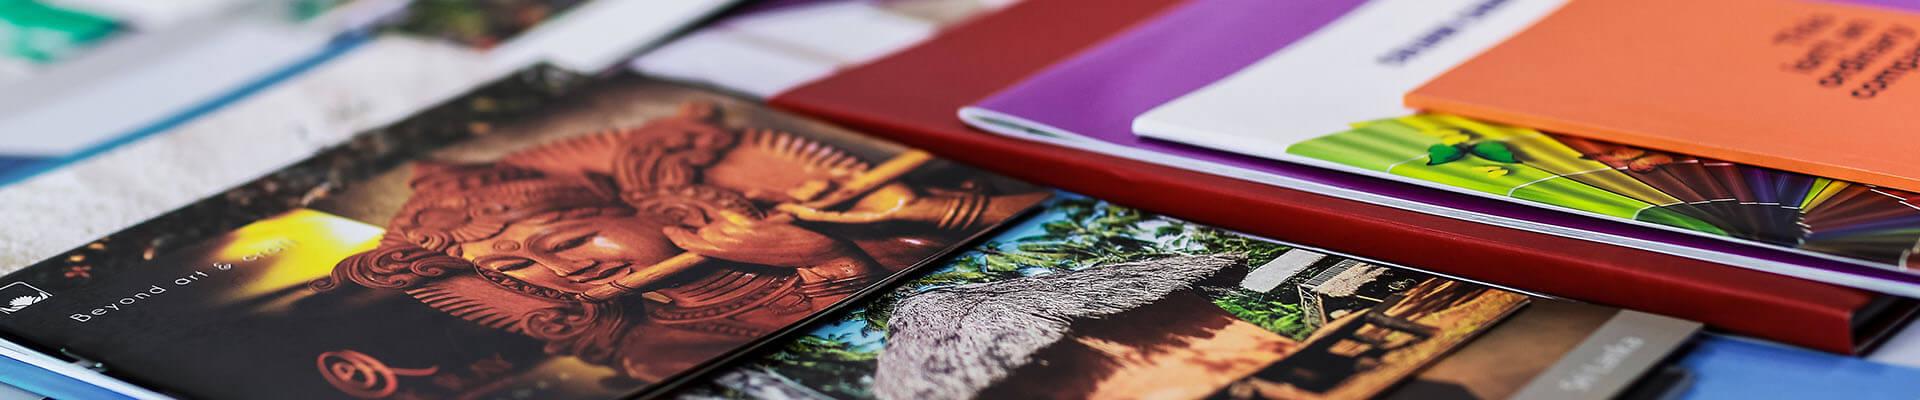 Superior Brochure Printing Services | Gunaratne Offset